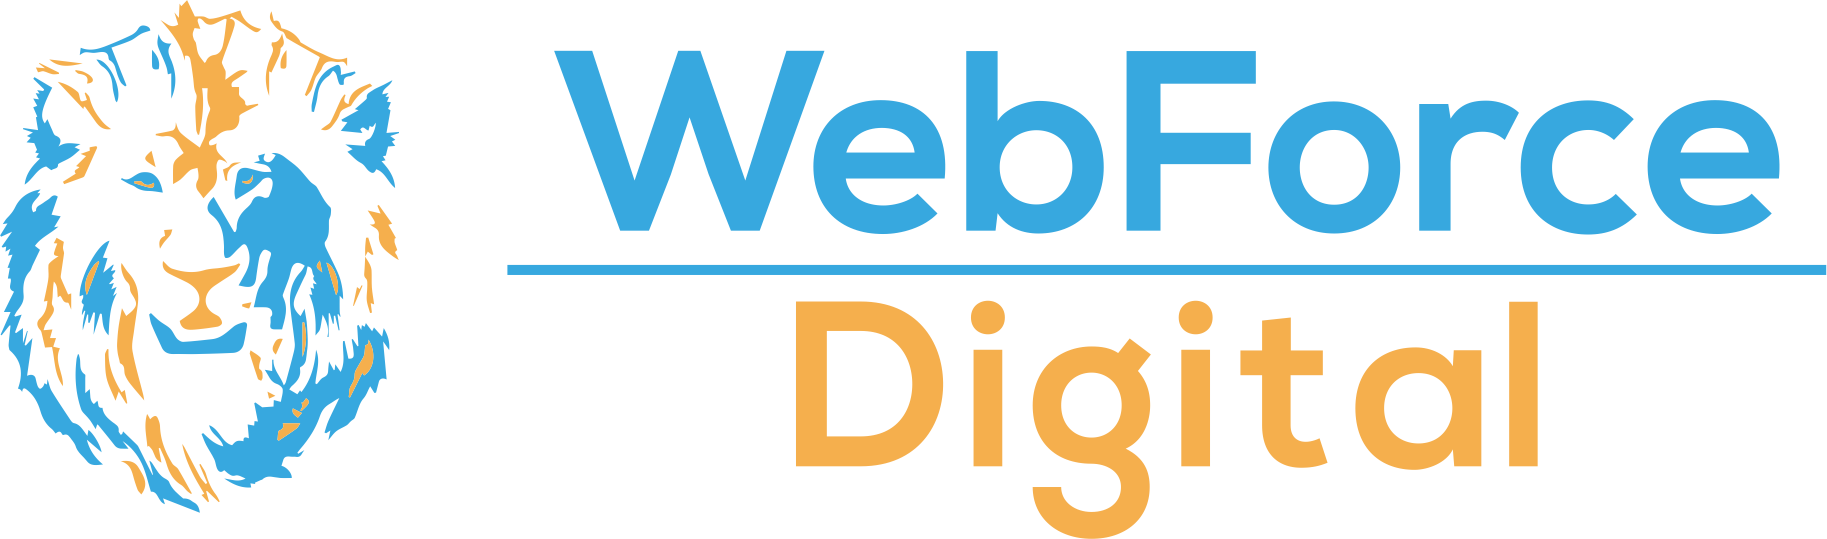 Webforce Digital